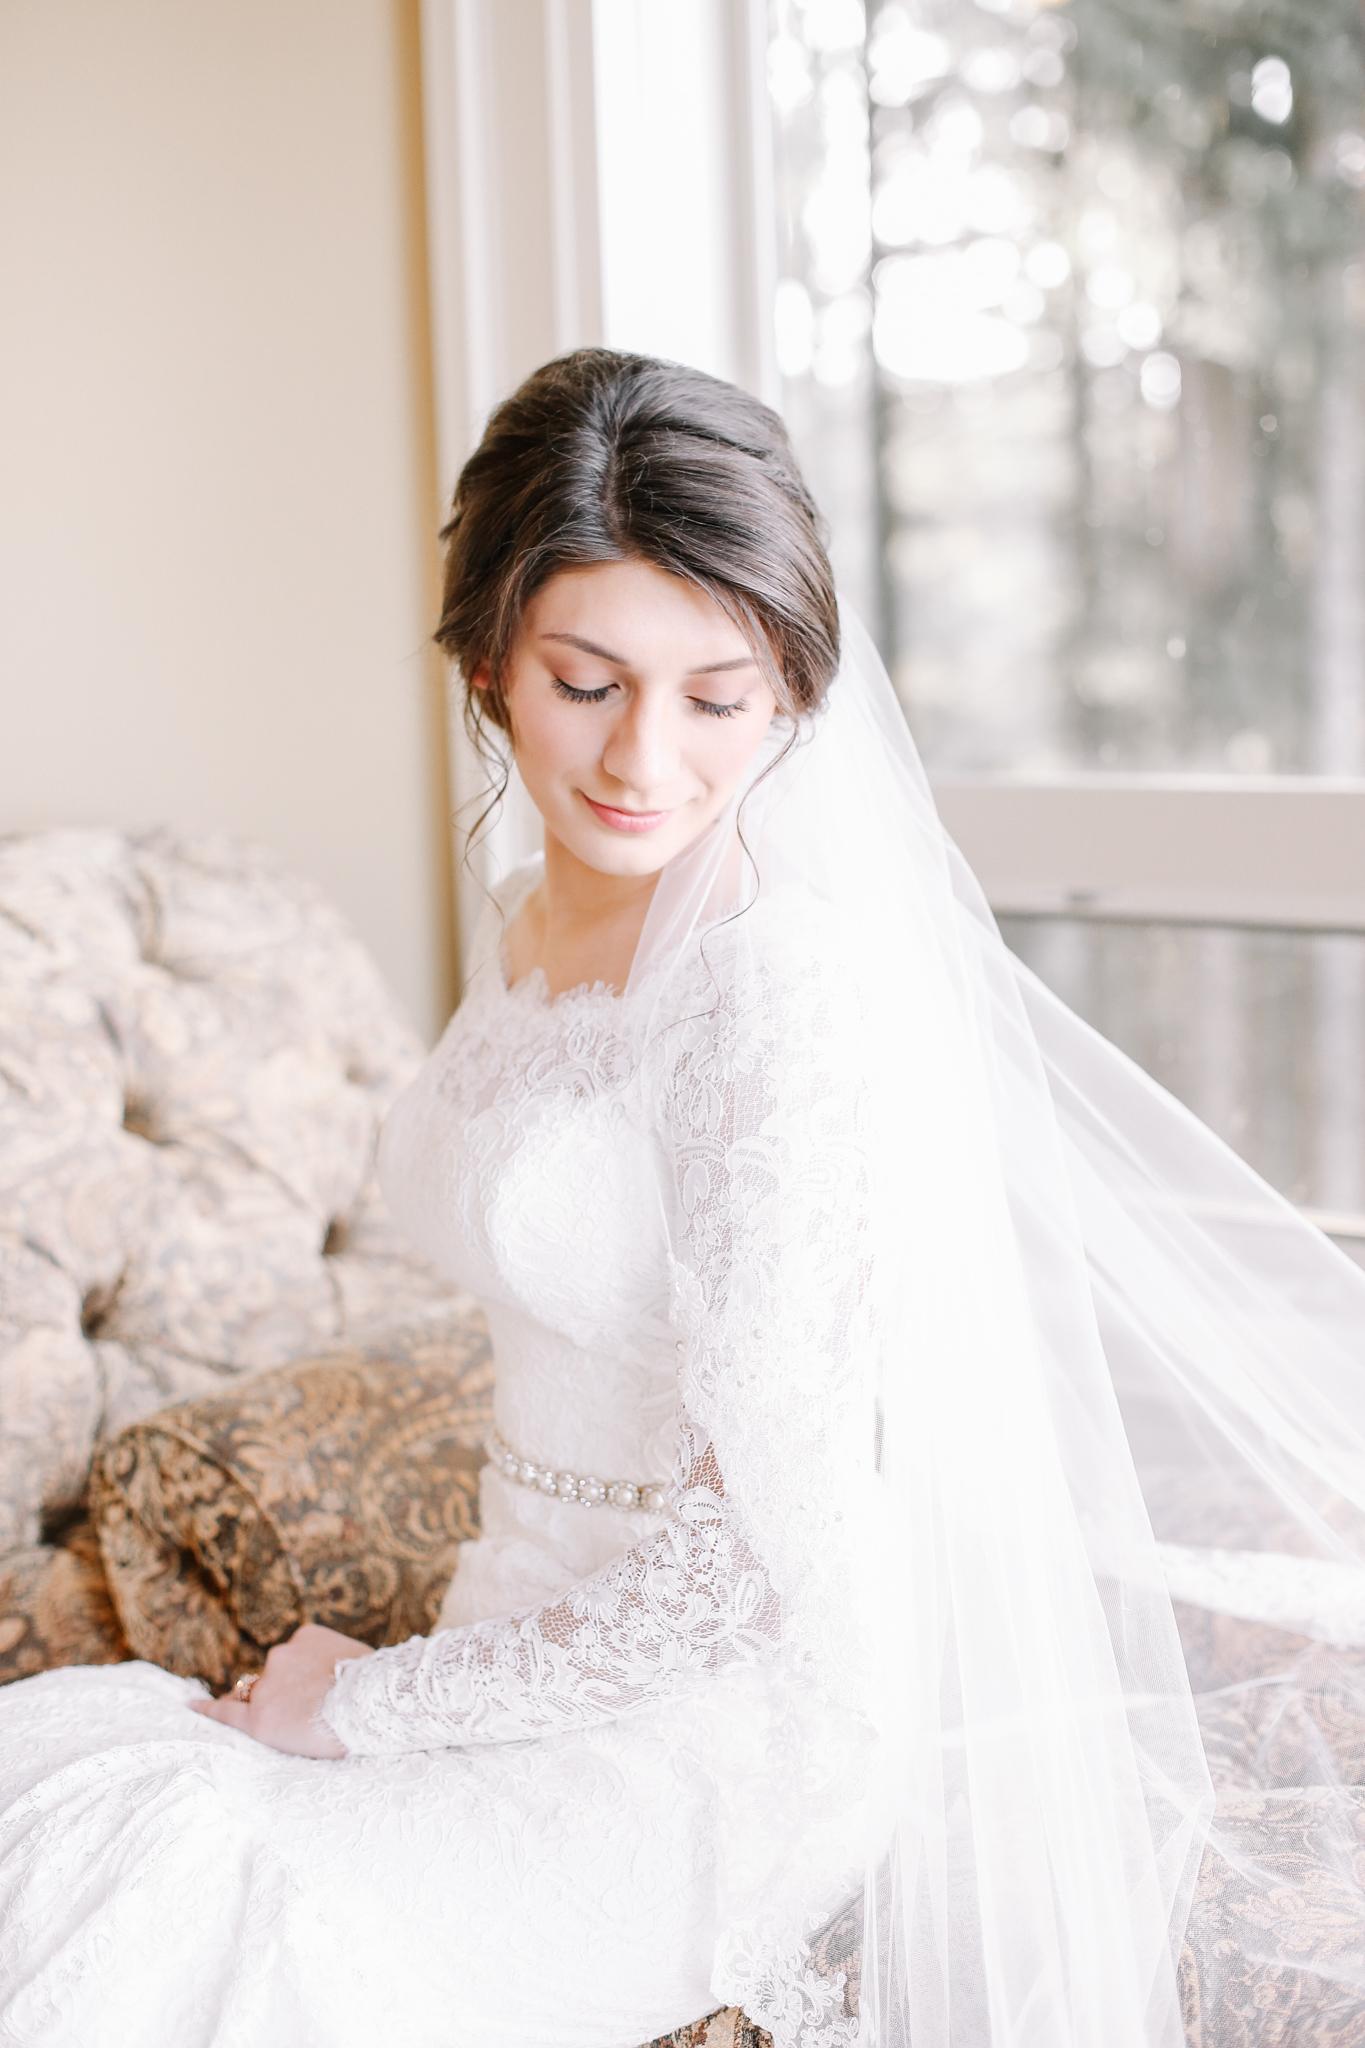 Manu and Laura - Portland Wedding Photographer - 10.jpg